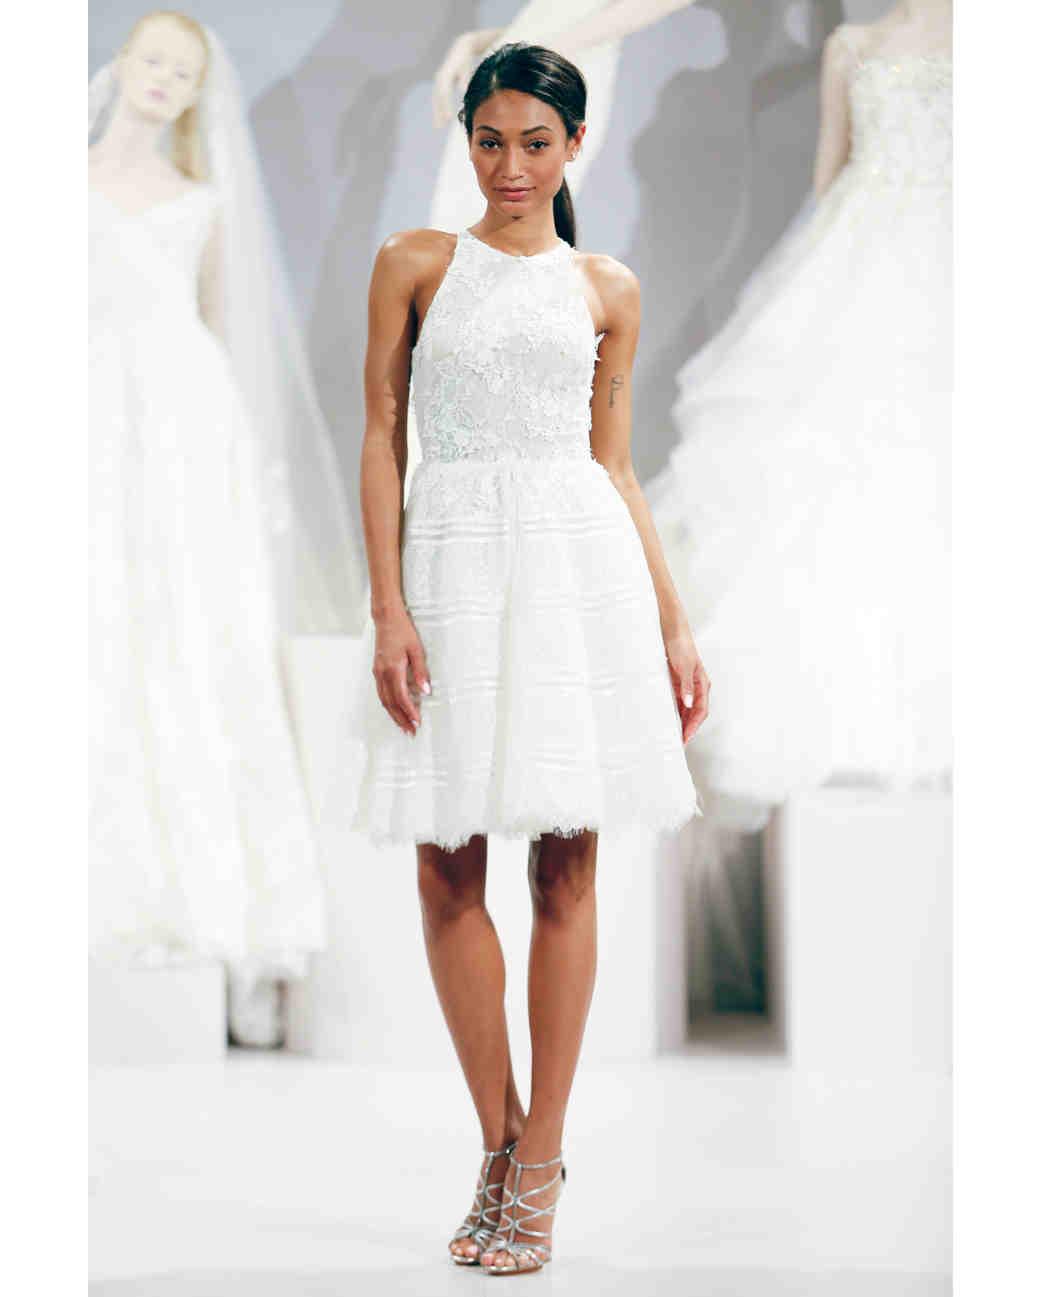 50-states-wedding-dresses-north-dakota-tony-ward-0615.jpg